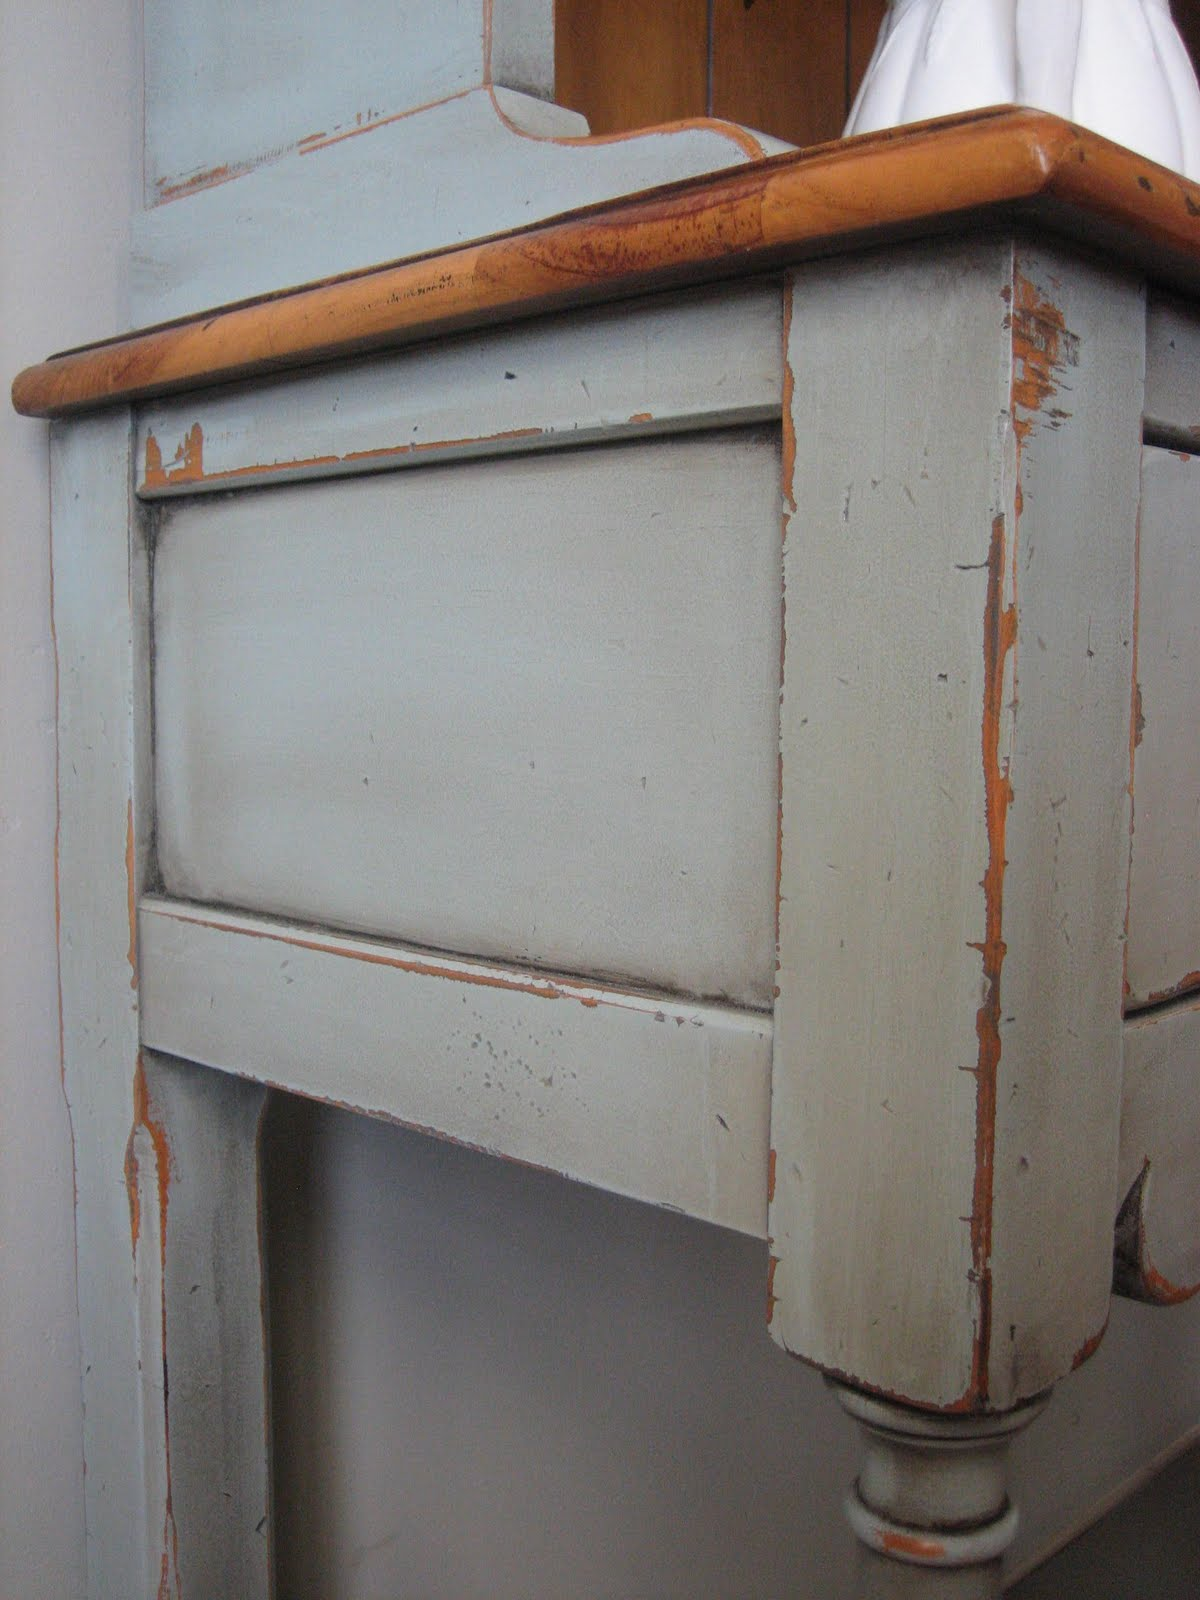 hutch china cabinet thomasville refinished furniture repurpose ...